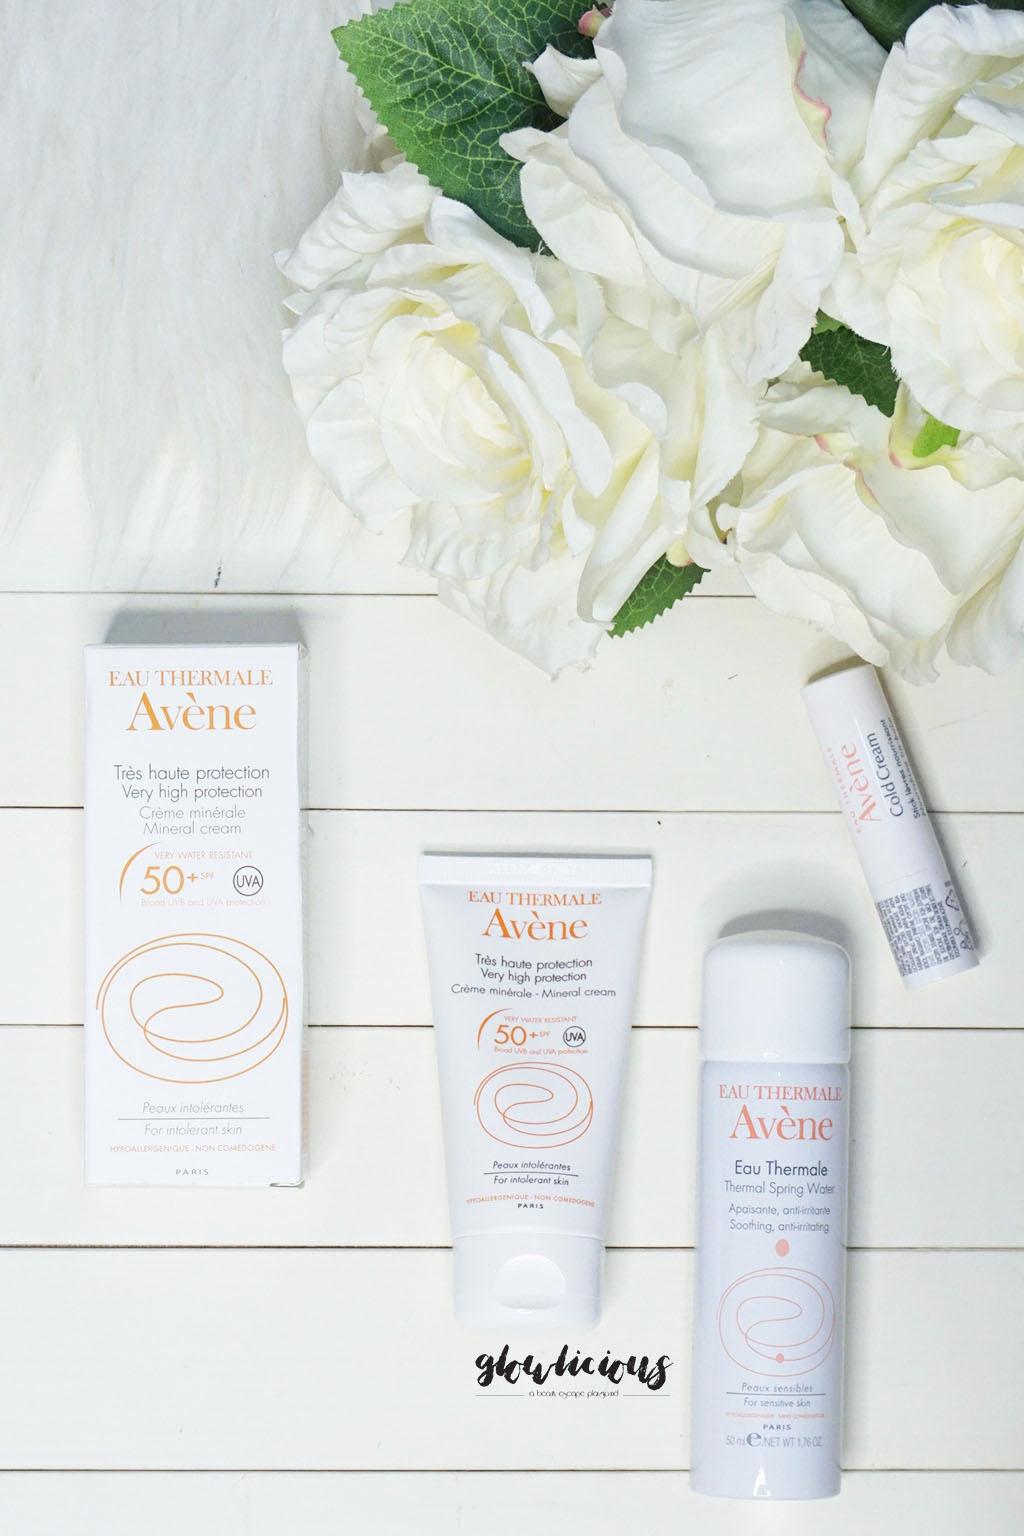 My New Favorit Product From Avene Indonesia - Avene Sunblock, Lip Balm, Face Spray